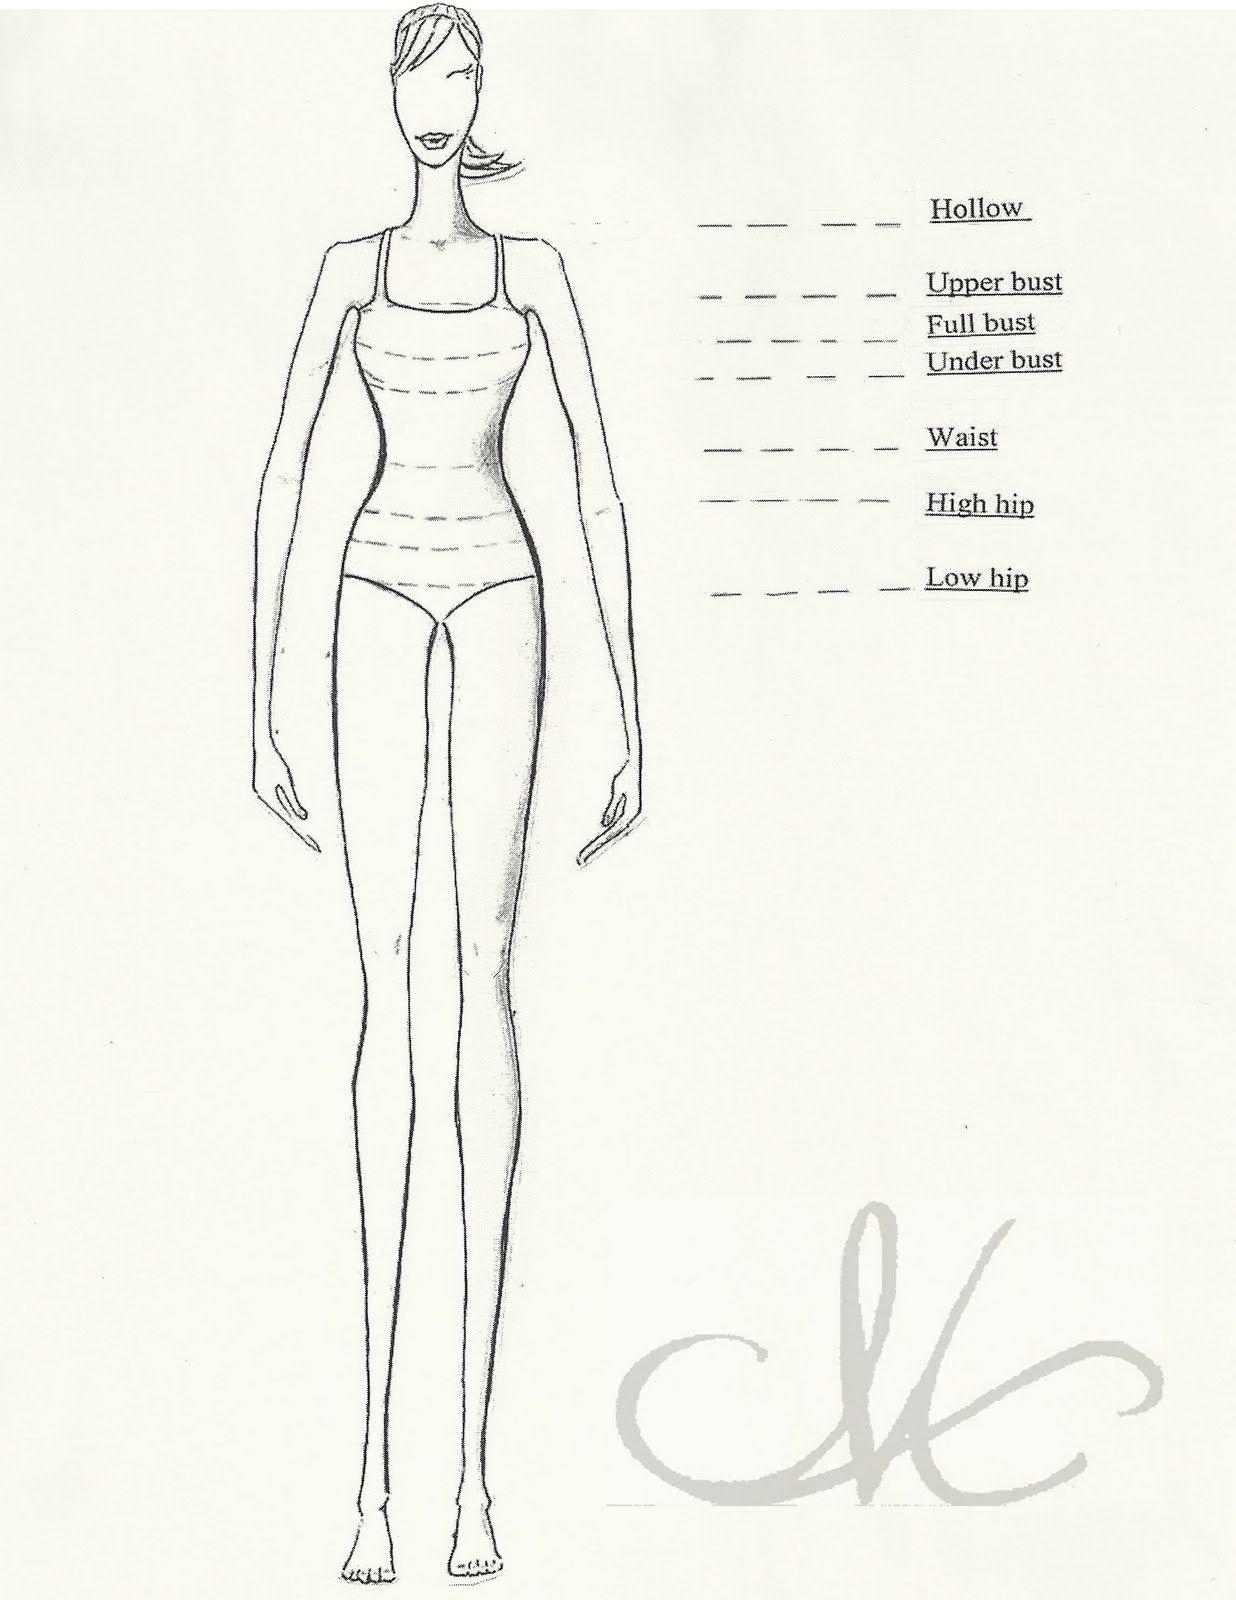 hight resolution of body shape diagrams body shape diagram